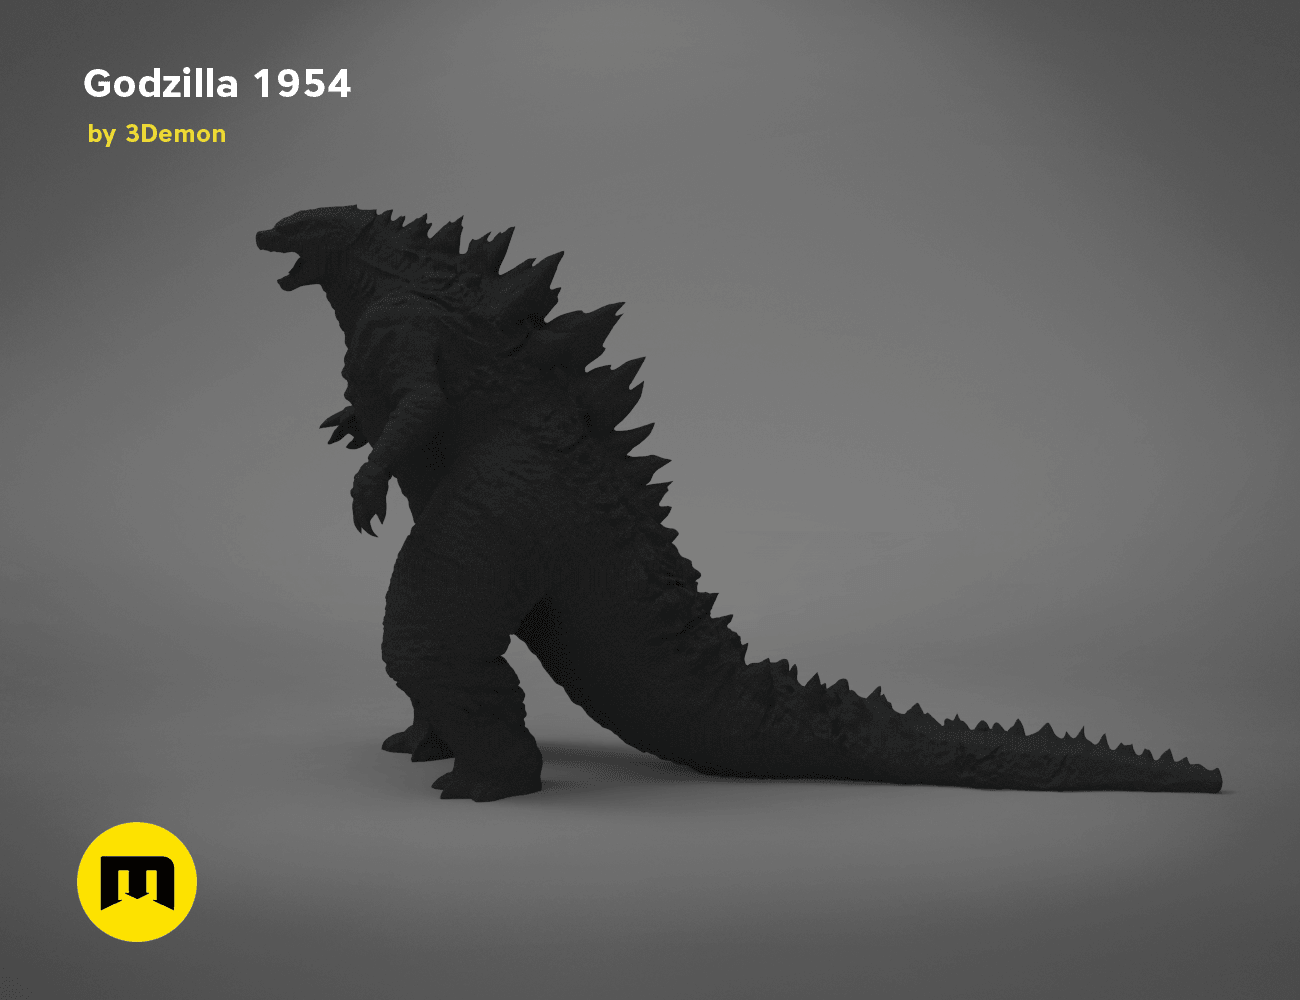 godzilla-black-japanese-right.197.png Download free OBJ file Godzilla 1954 figure and bottle opener • 3D printer model, 3D-mon